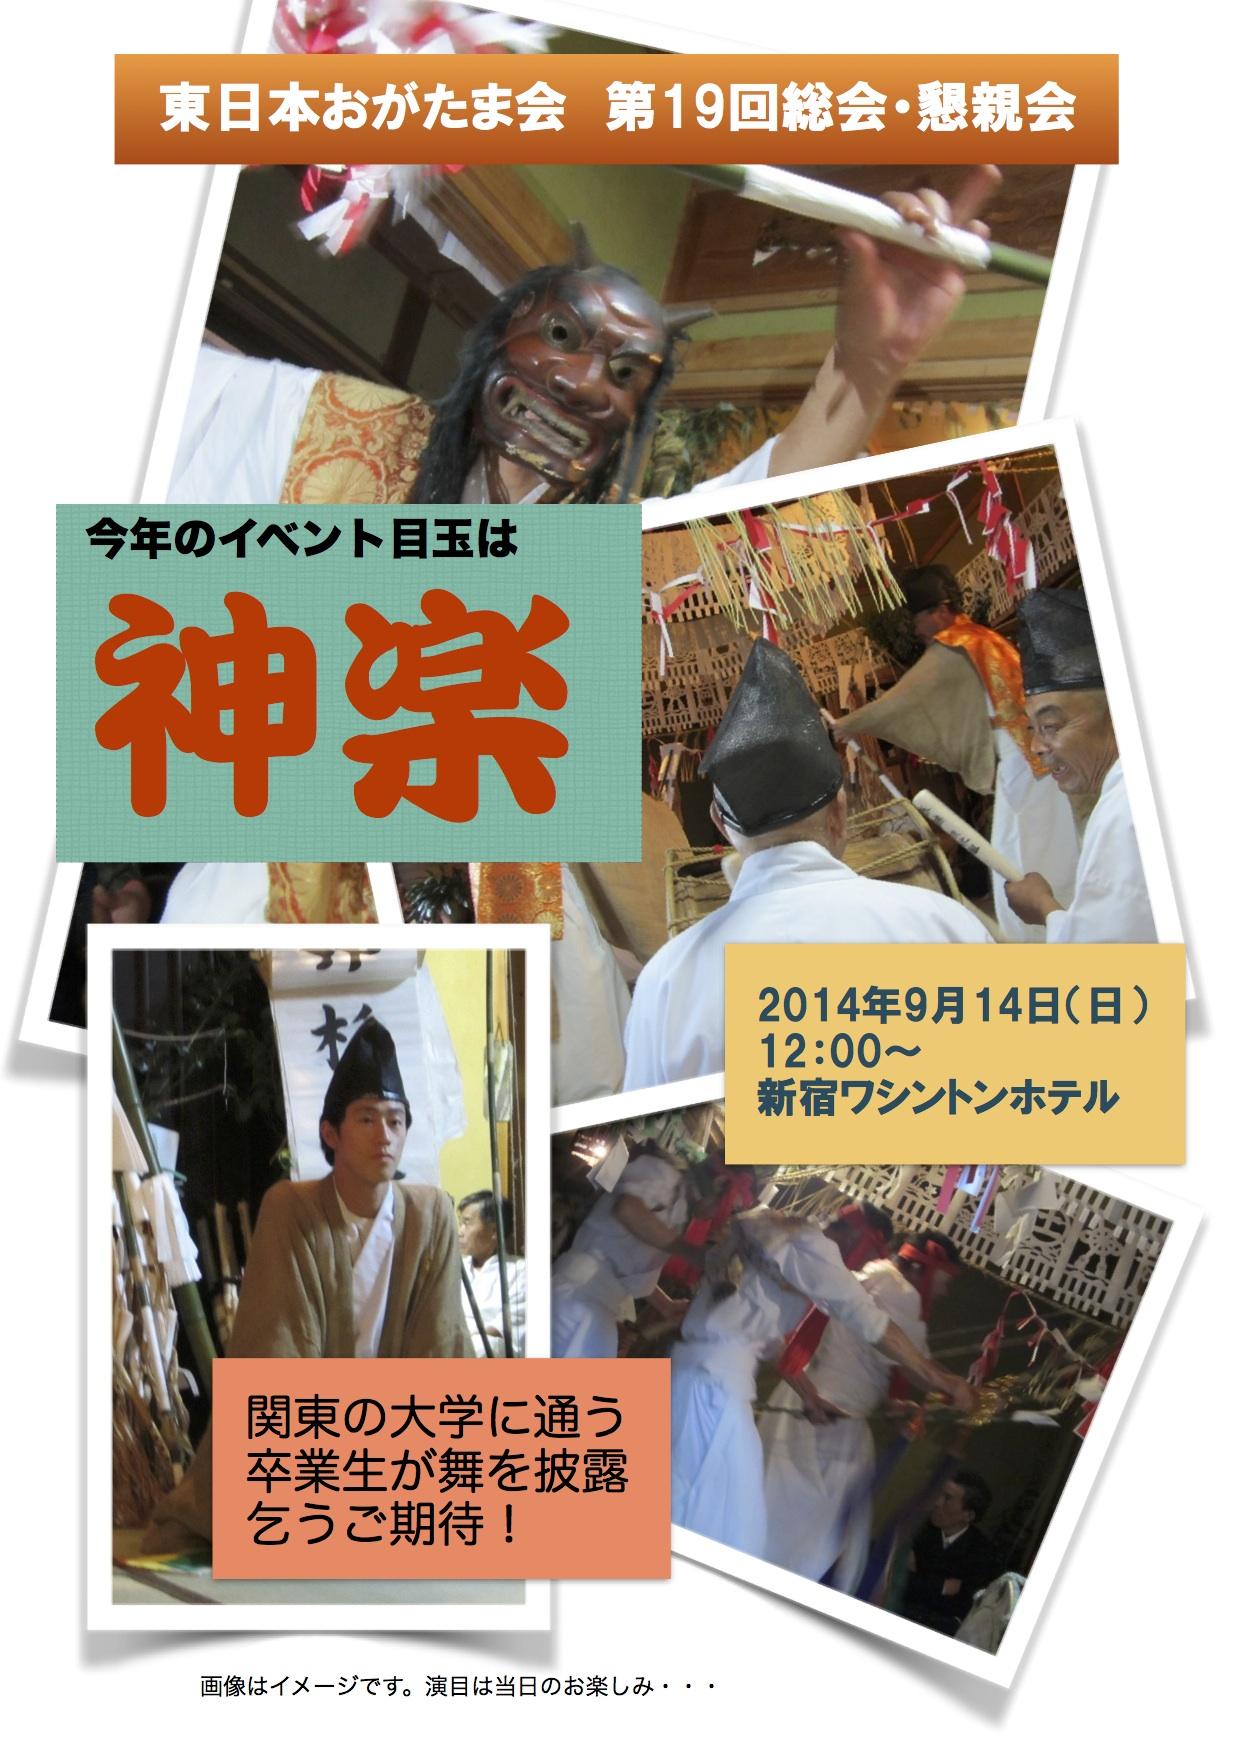 H26おがたま会(神楽)